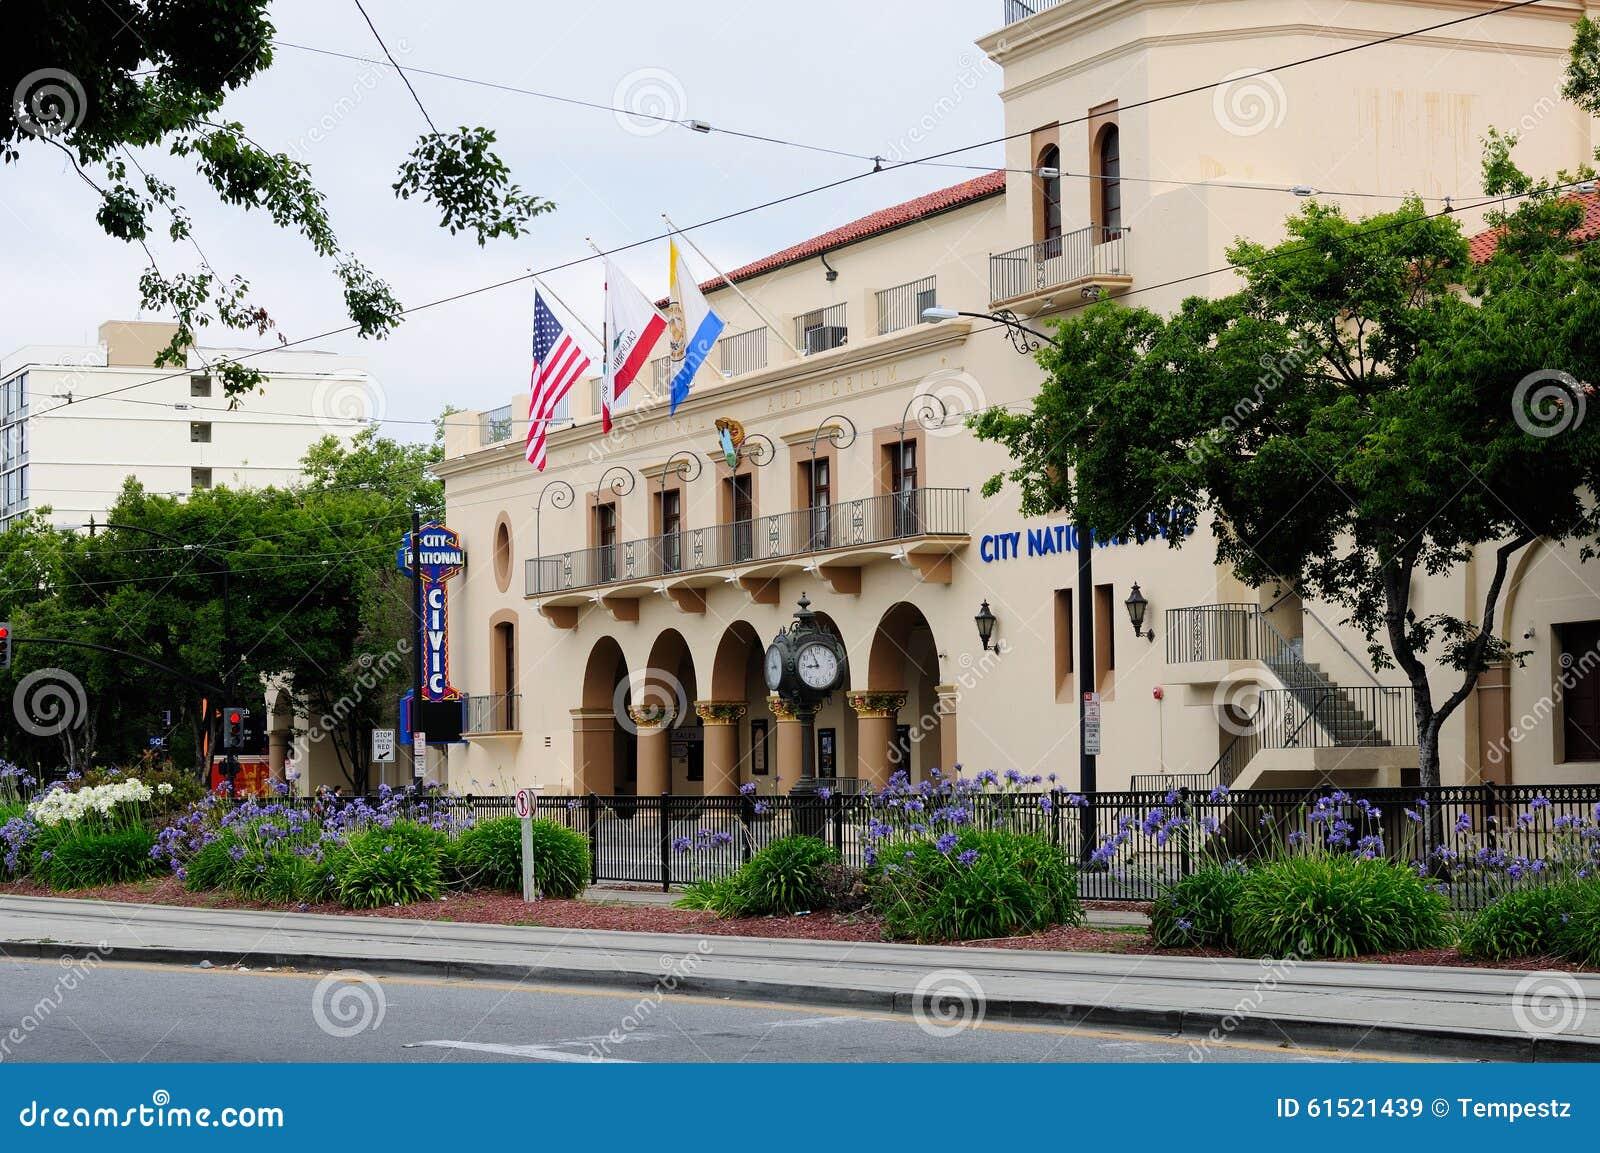 San Jose City National Civic Building